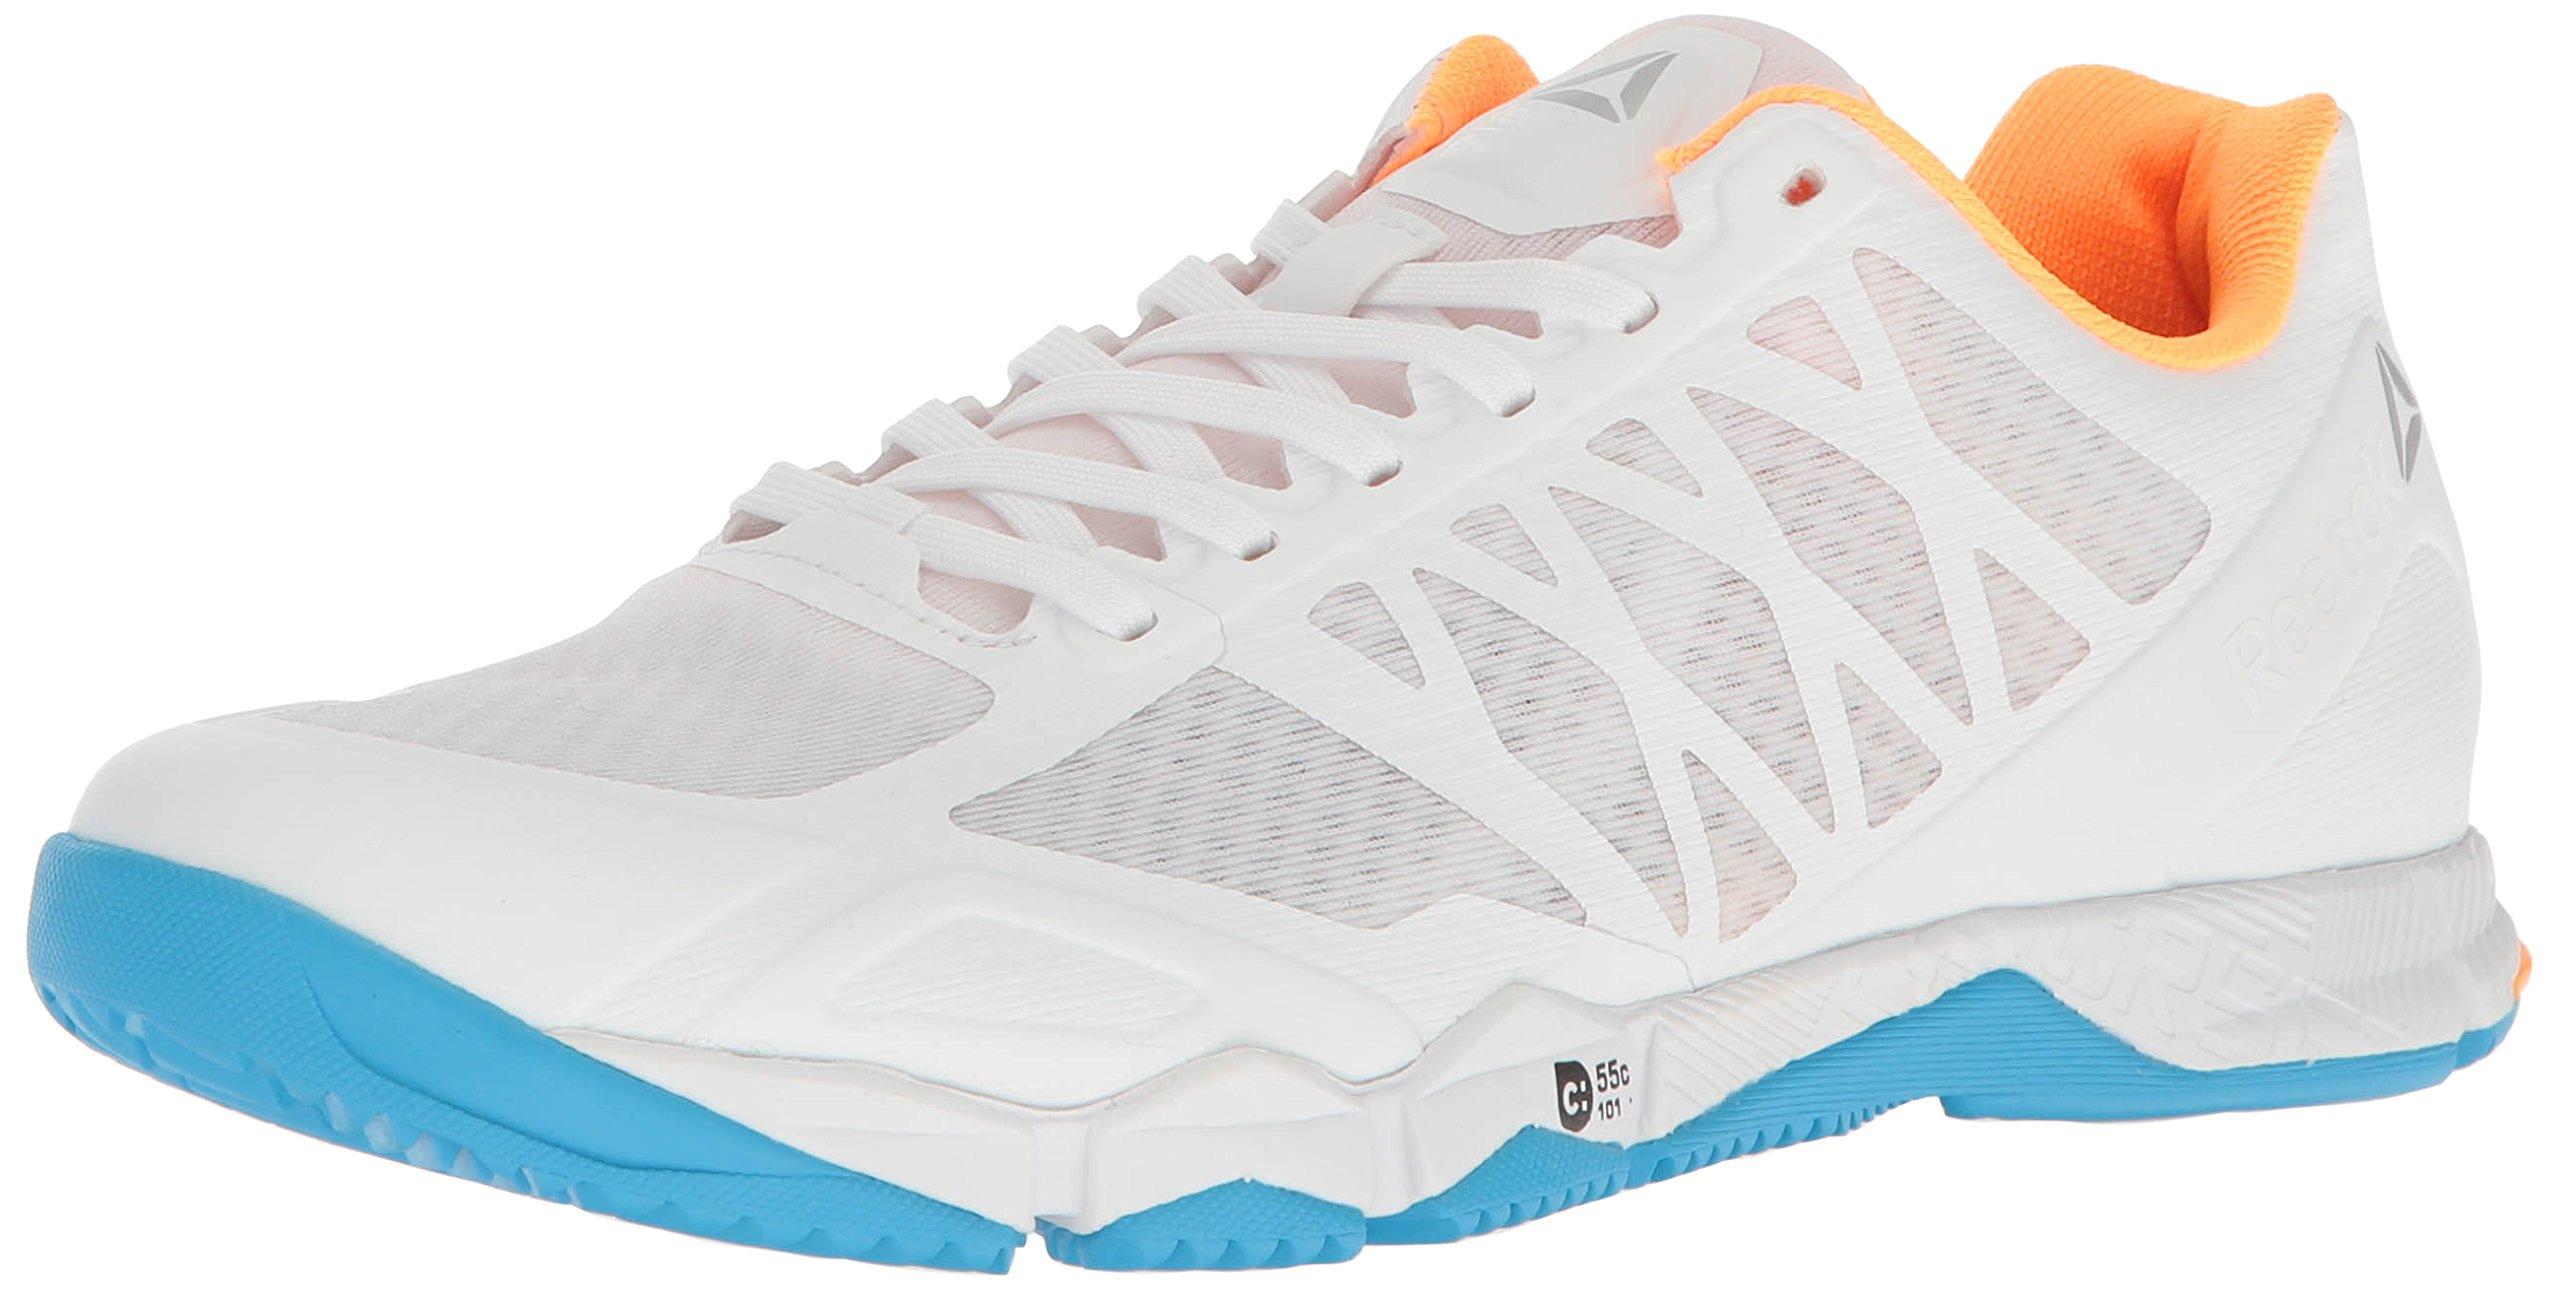 Reebok Women's Crossfit Speed Tr Cross-Trainer Shoe,White/Black/Blue Beam/Fire Spark/Pure Silver,8 M US